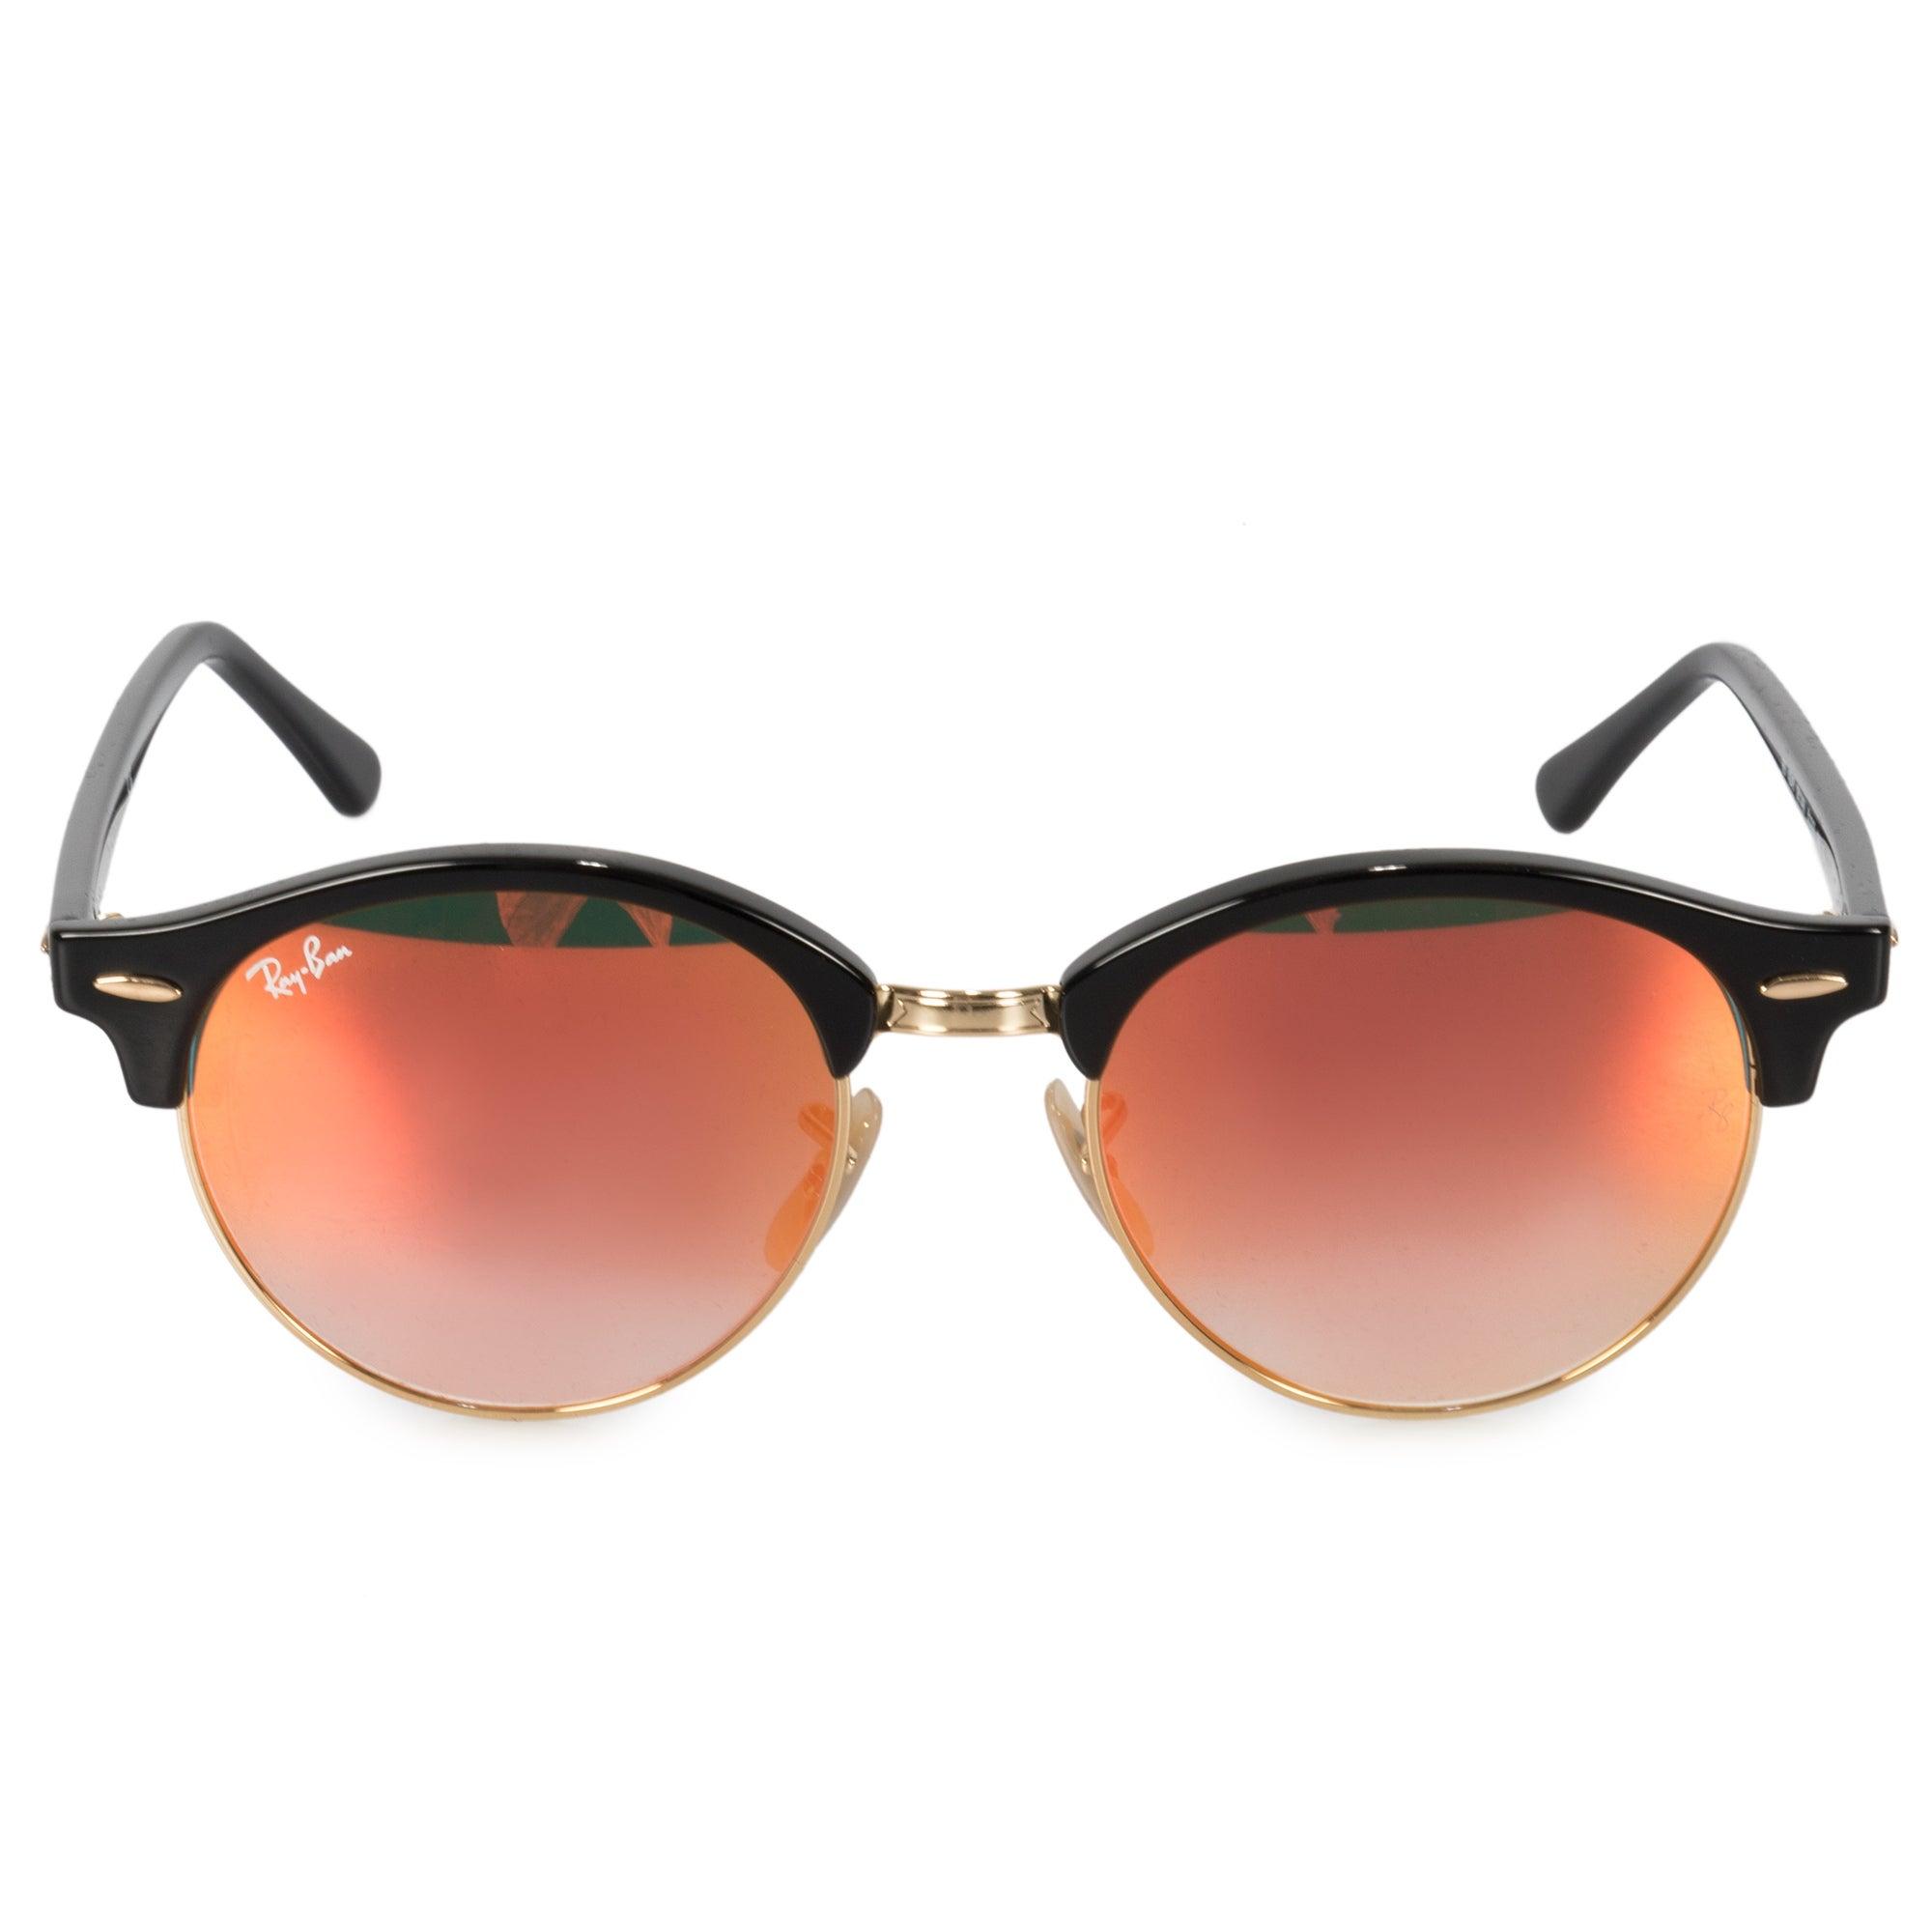 cf19230b17a93 Ray-Ban Women s Sunglasses